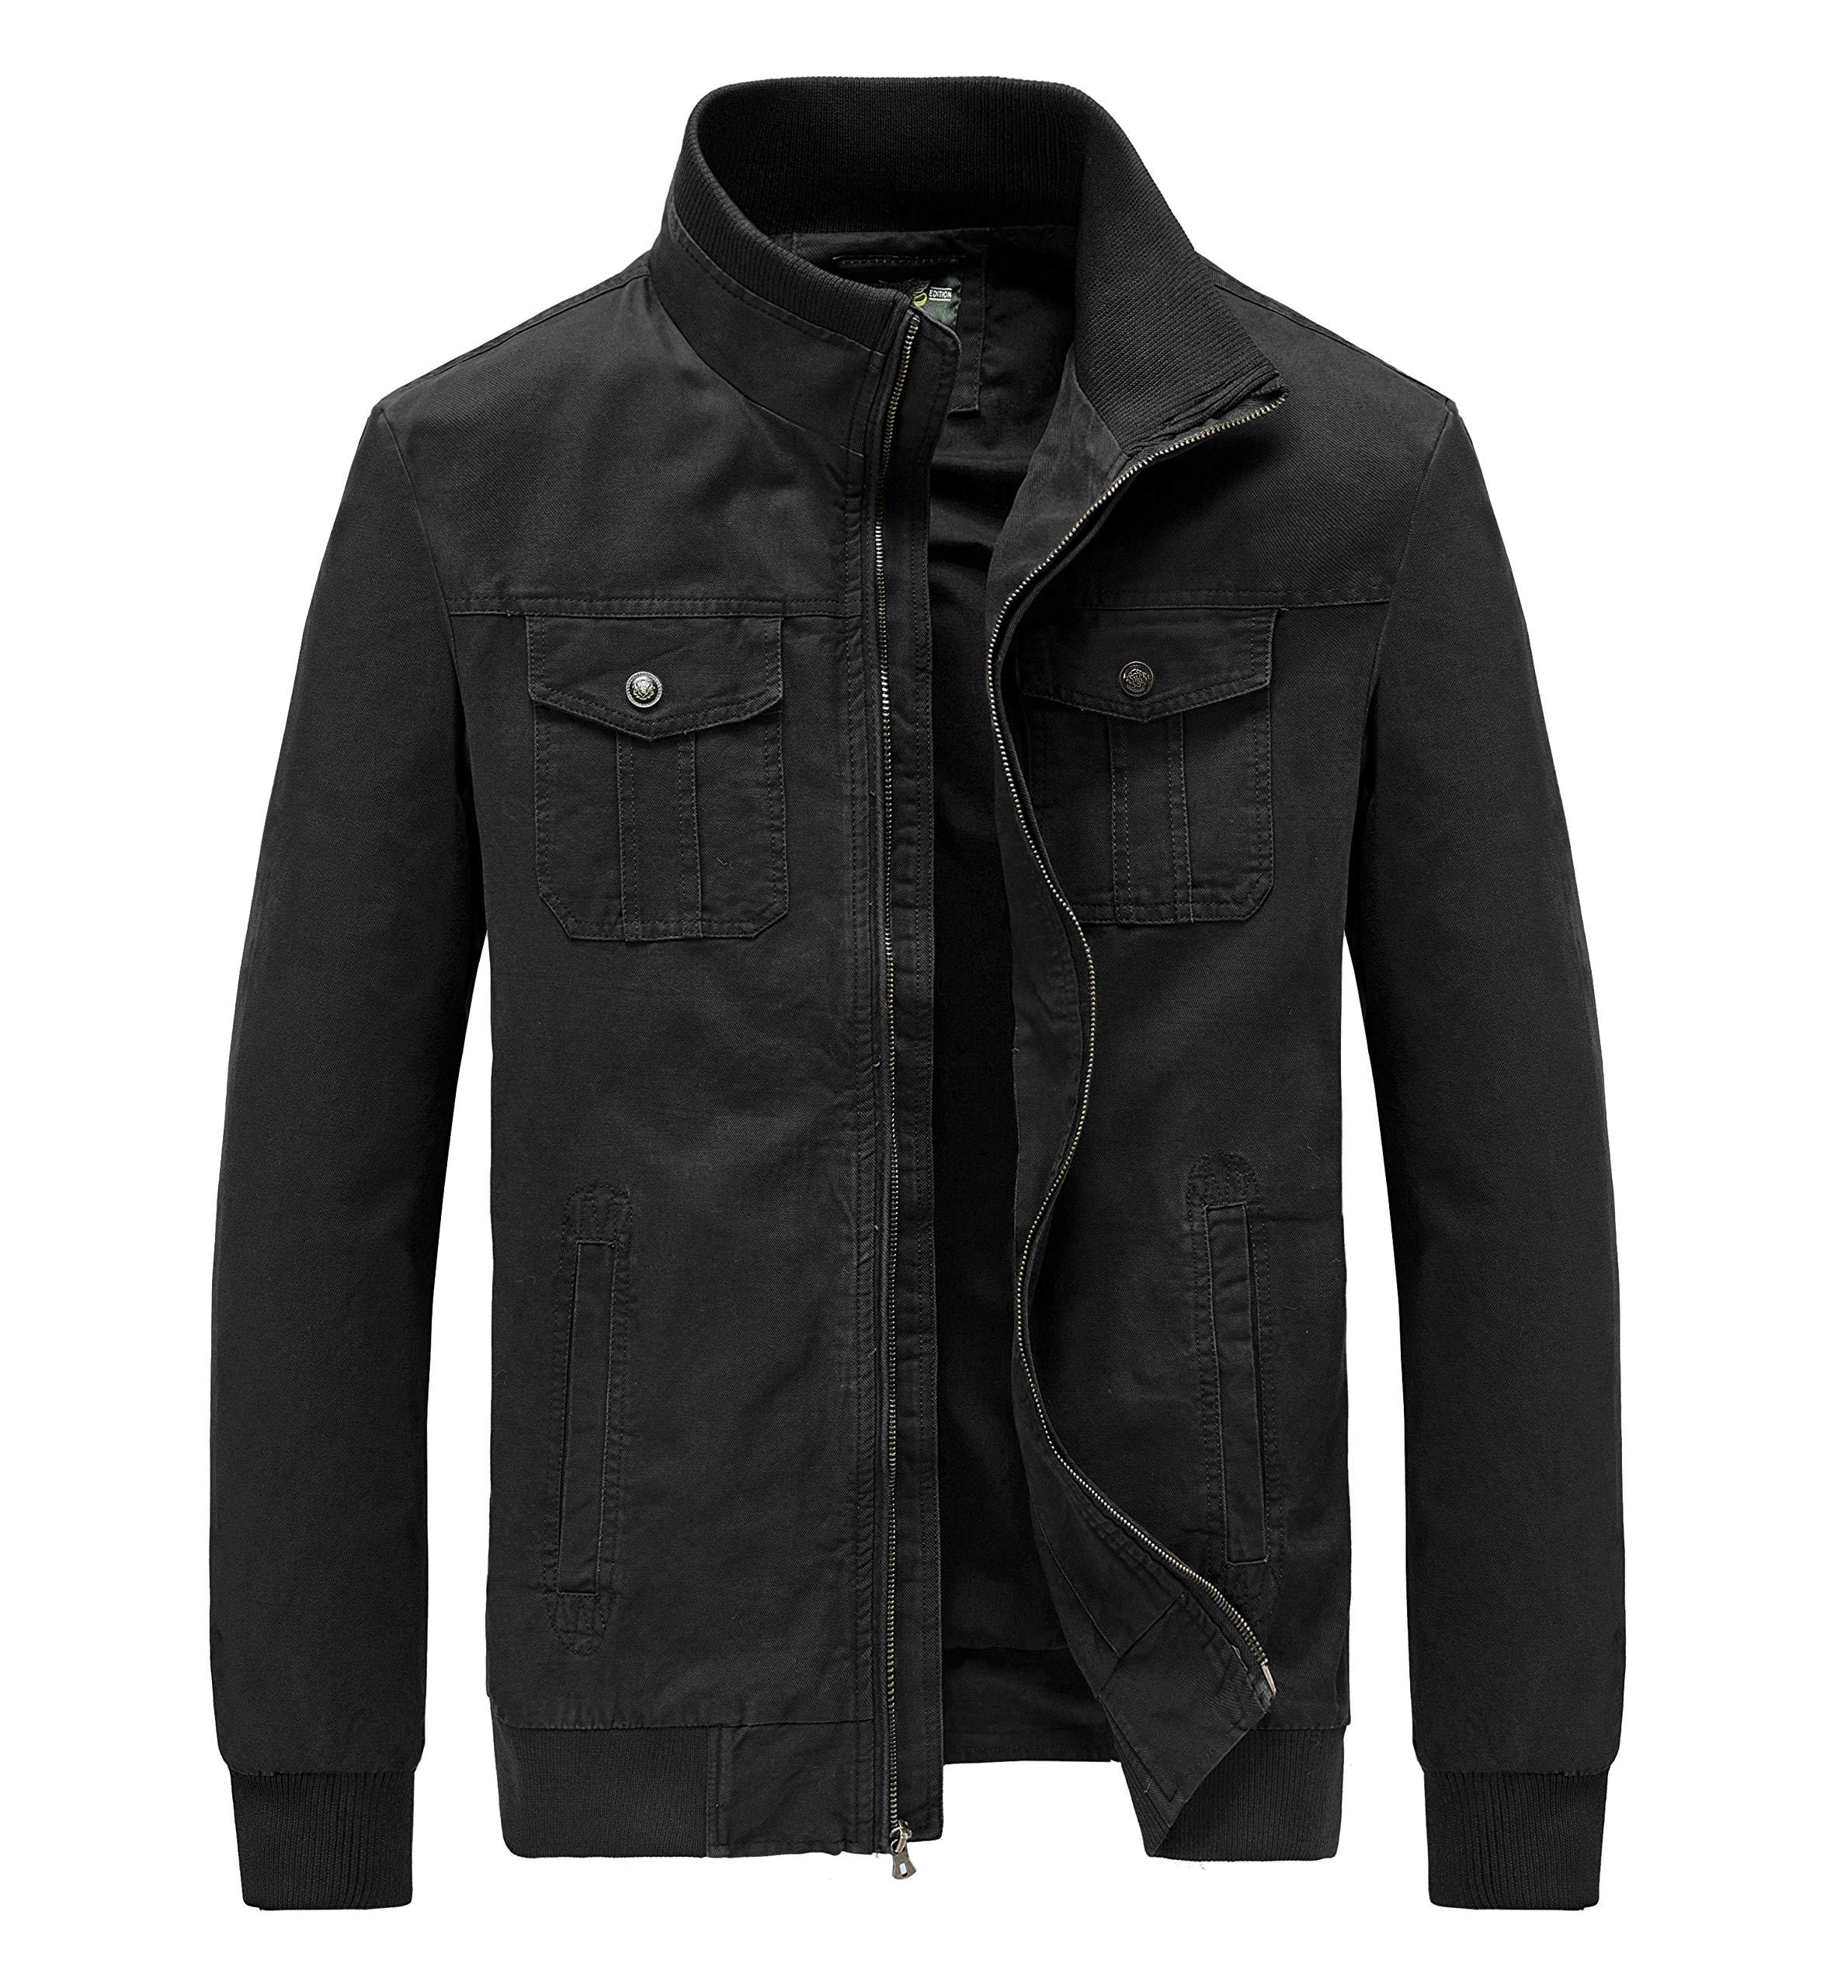 JYG Men's Casual Military Windbreaker Jacket Cotton Stand Collar Field Coat with Shoulder Straps (Medium, Black-8817) by JYG